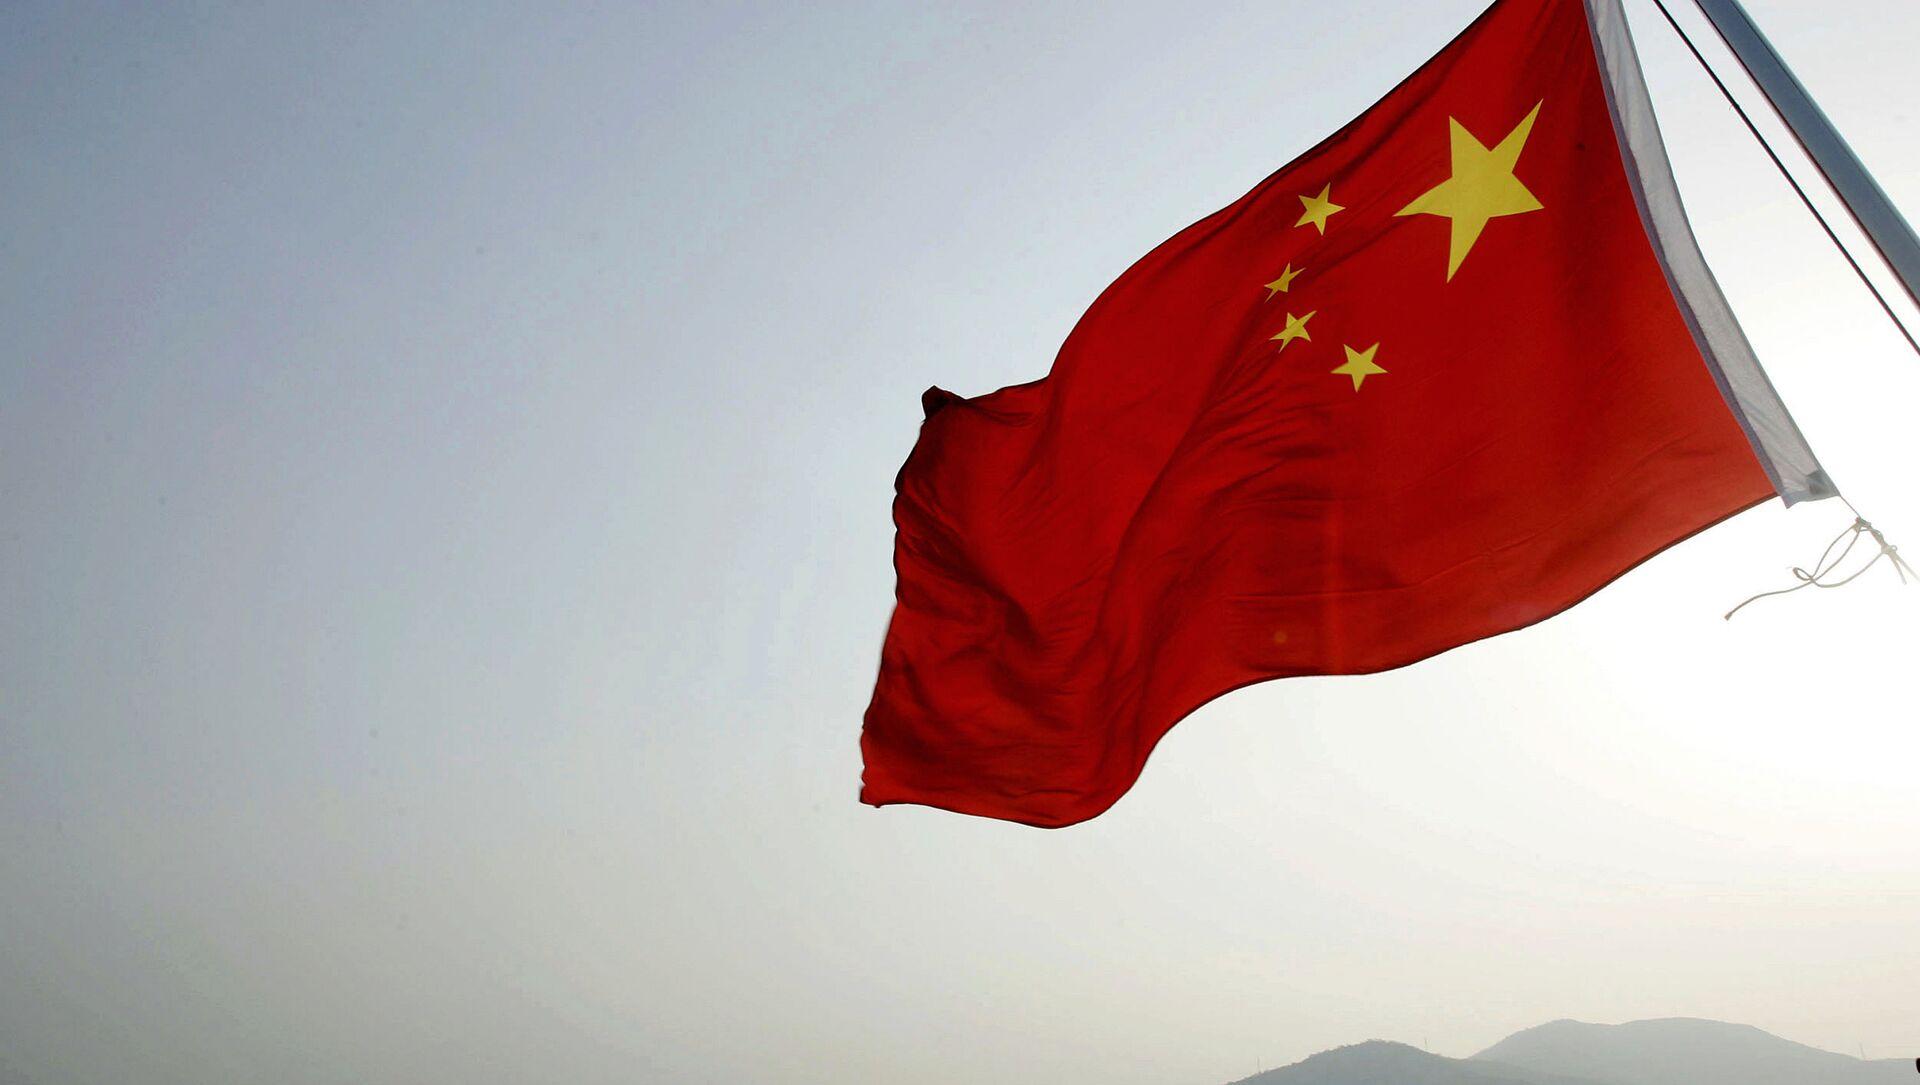 La bandiera cinese - Sputnik Italia, 1920, 17.03.2021